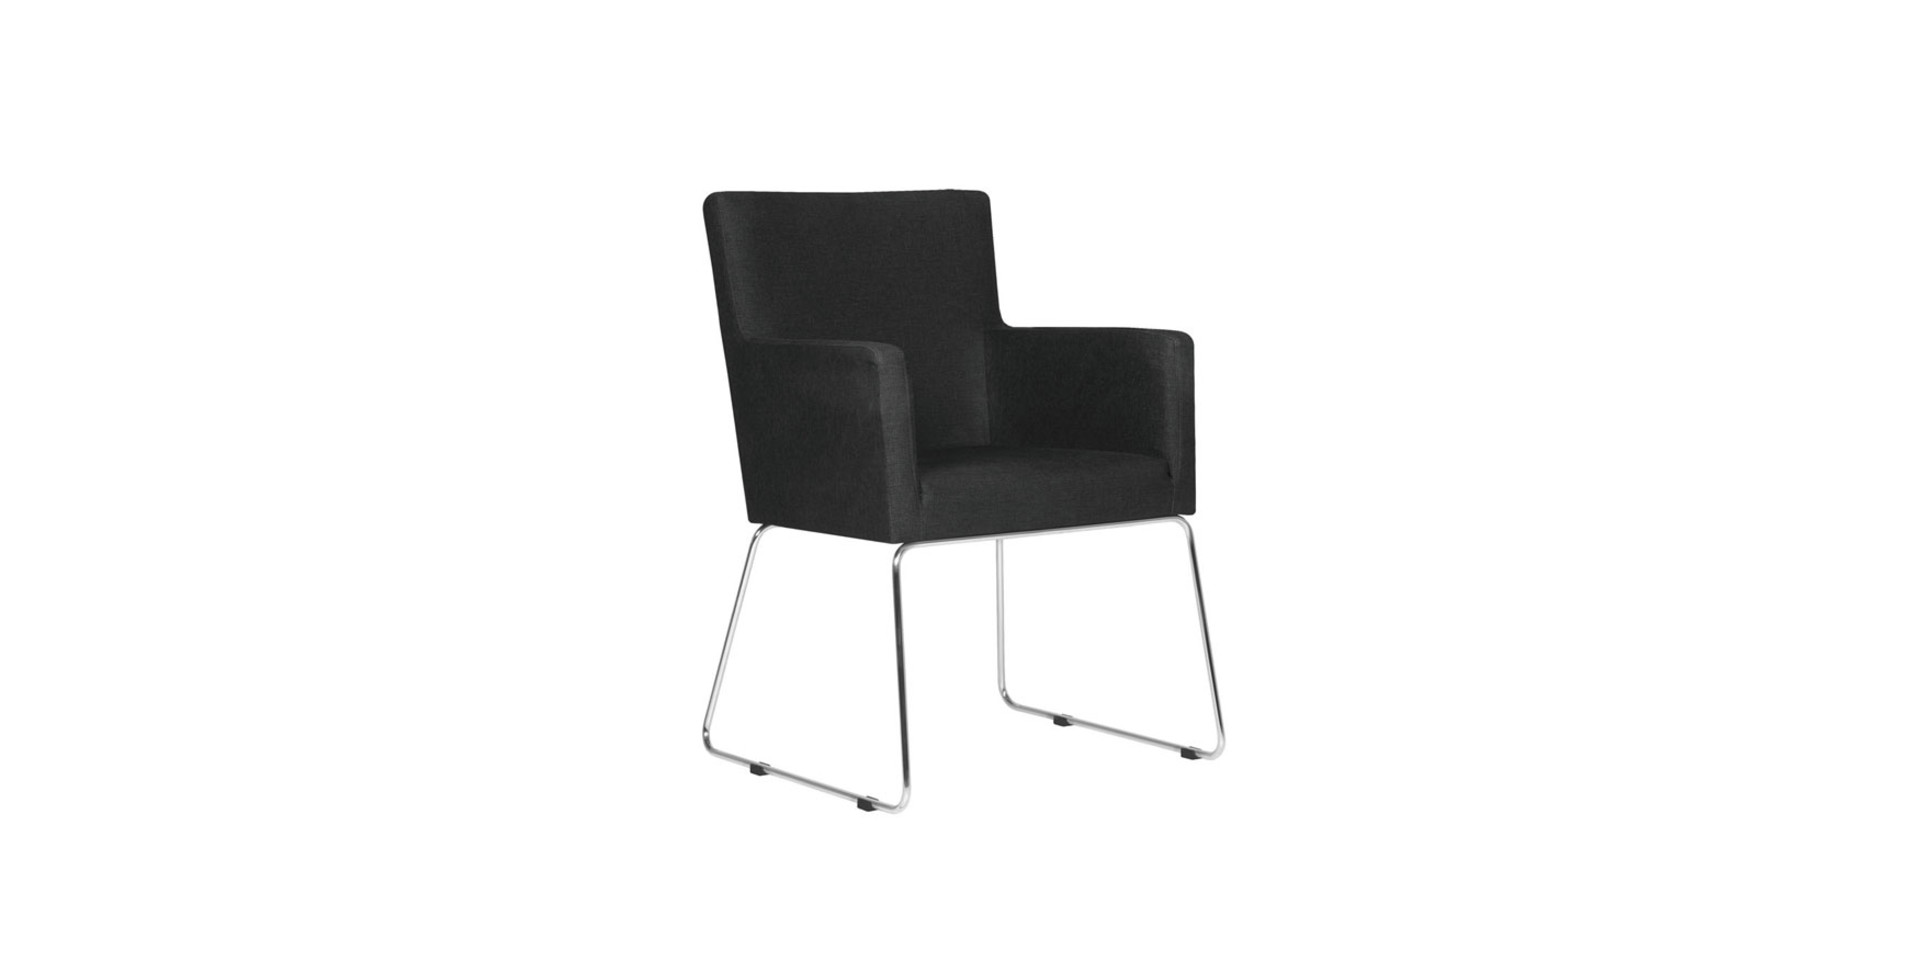 sits-clark-fauteuil-chair_drom55_black_2